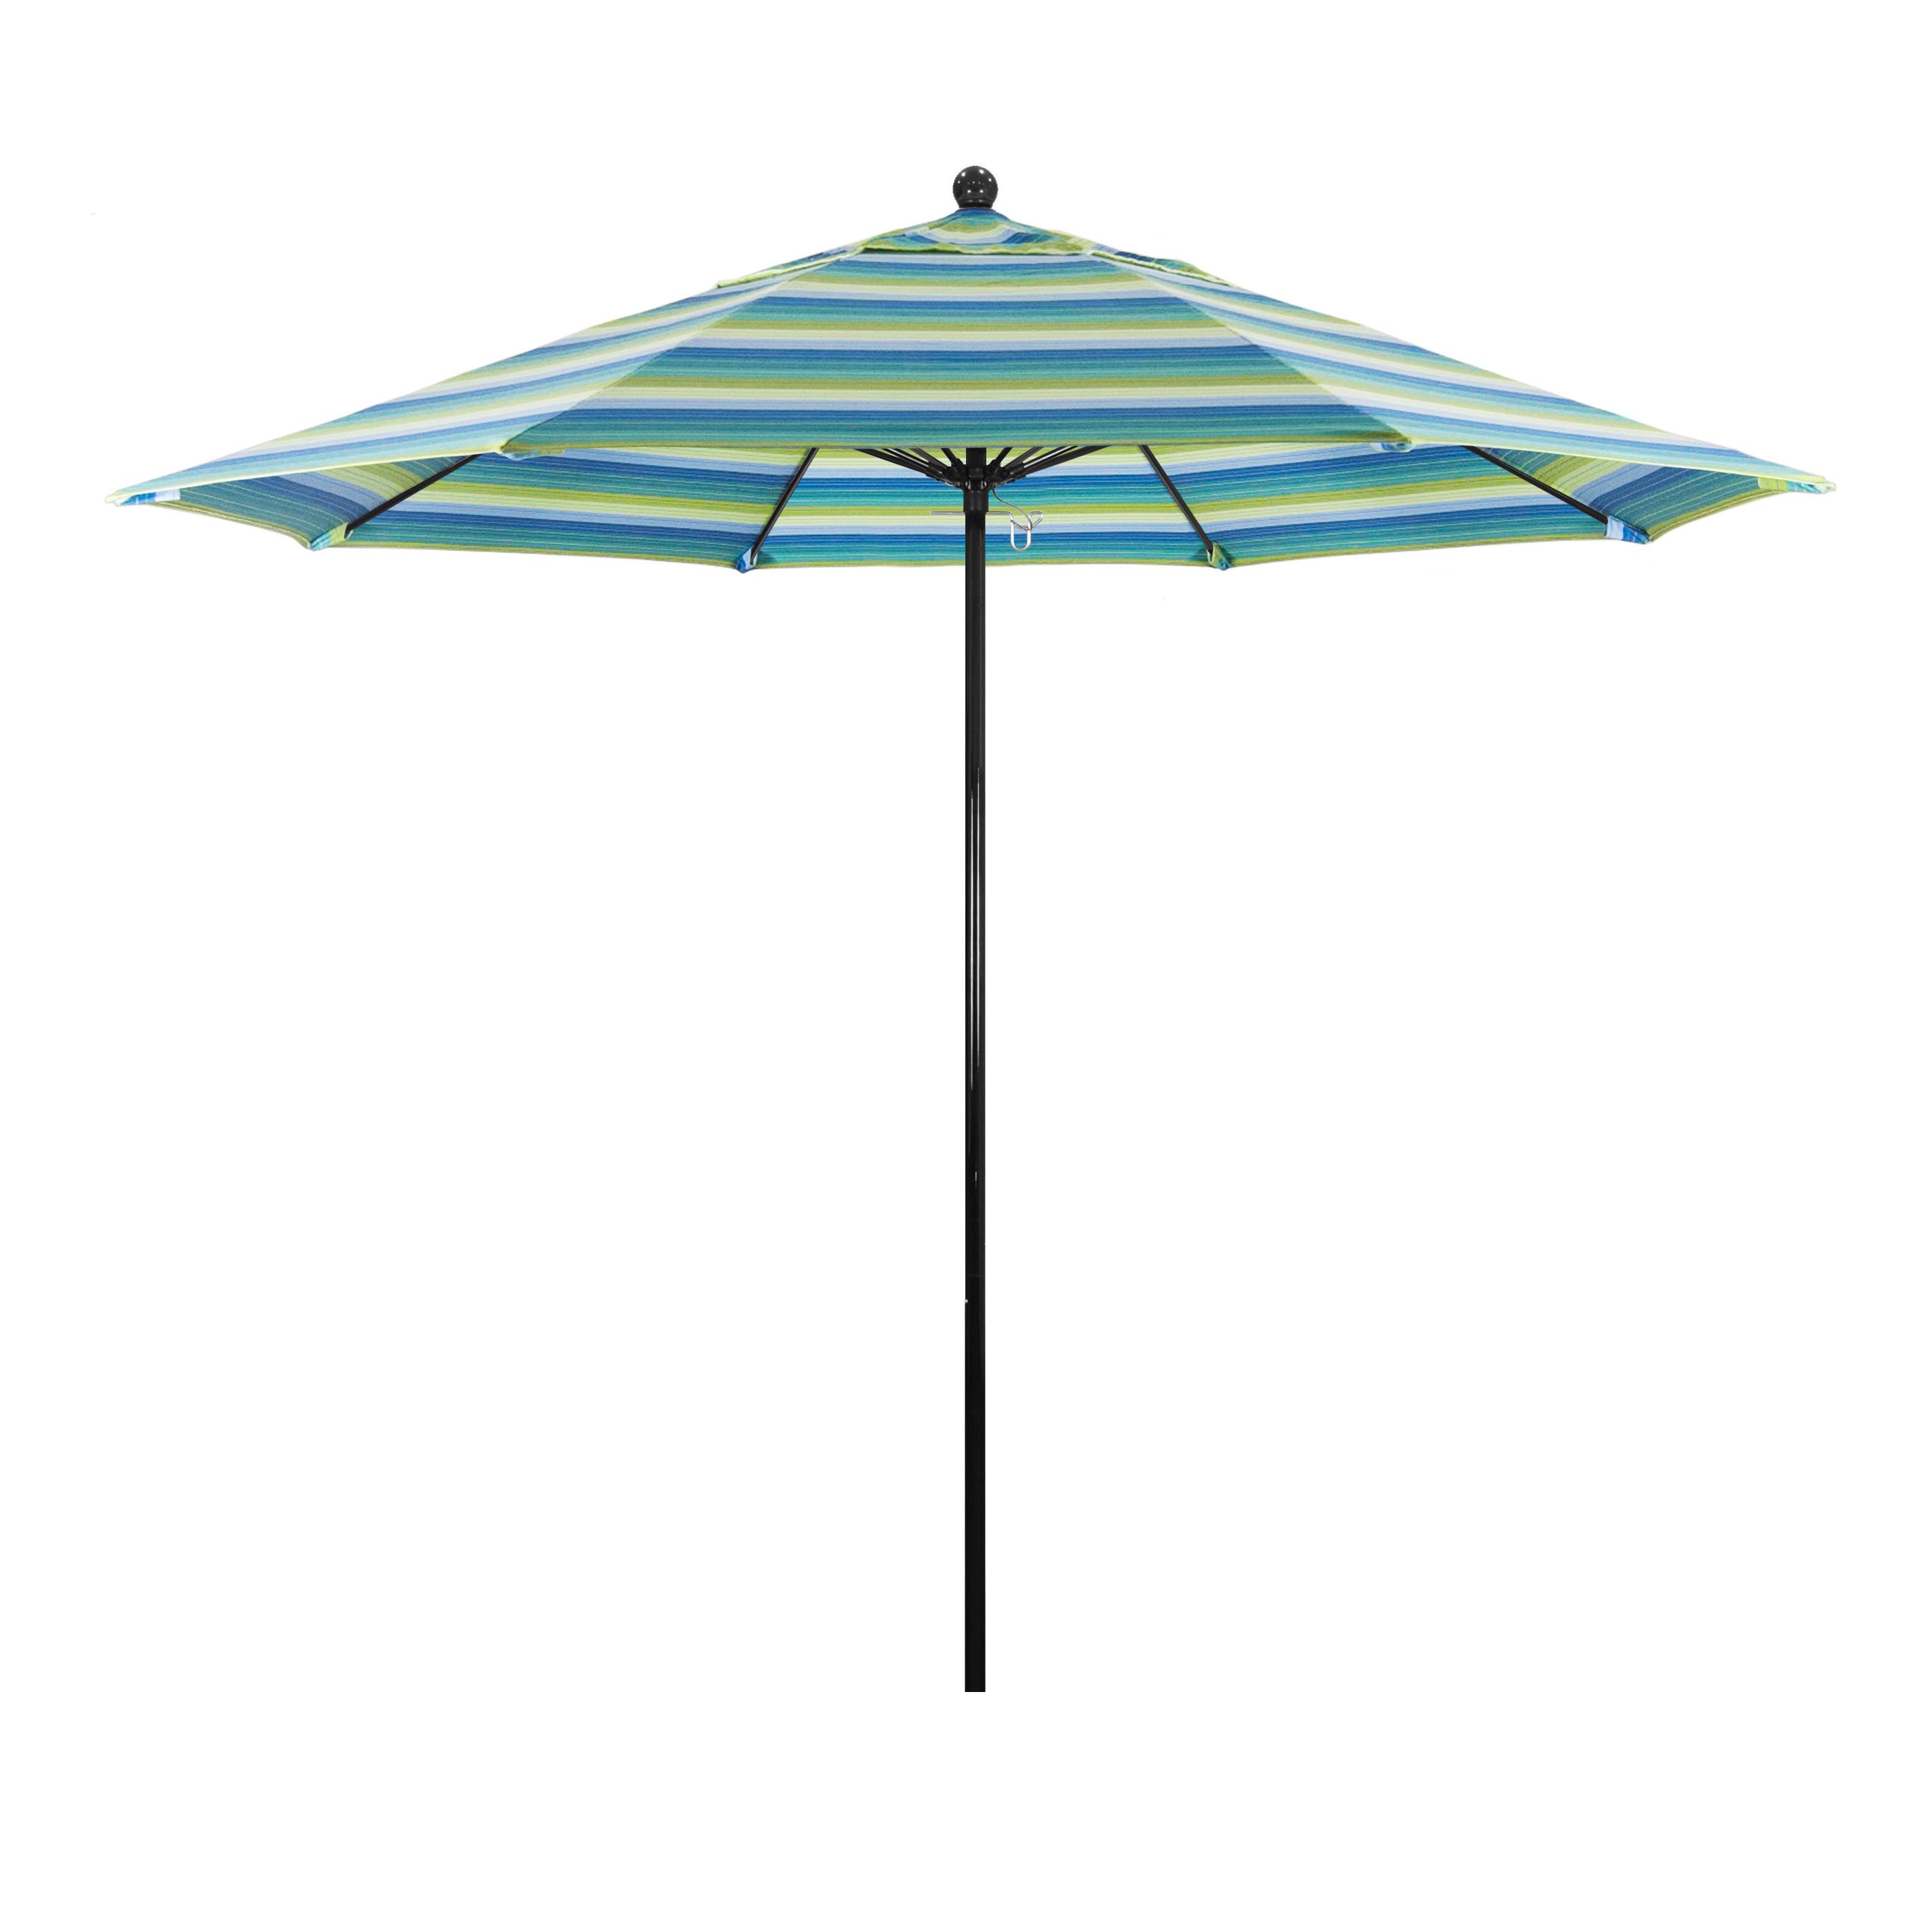 Oceanside Series 9' Market Sunbrella Umbrella Inside Current Wiebe Market Sunbrella Umbrellas (View 10 of 20)